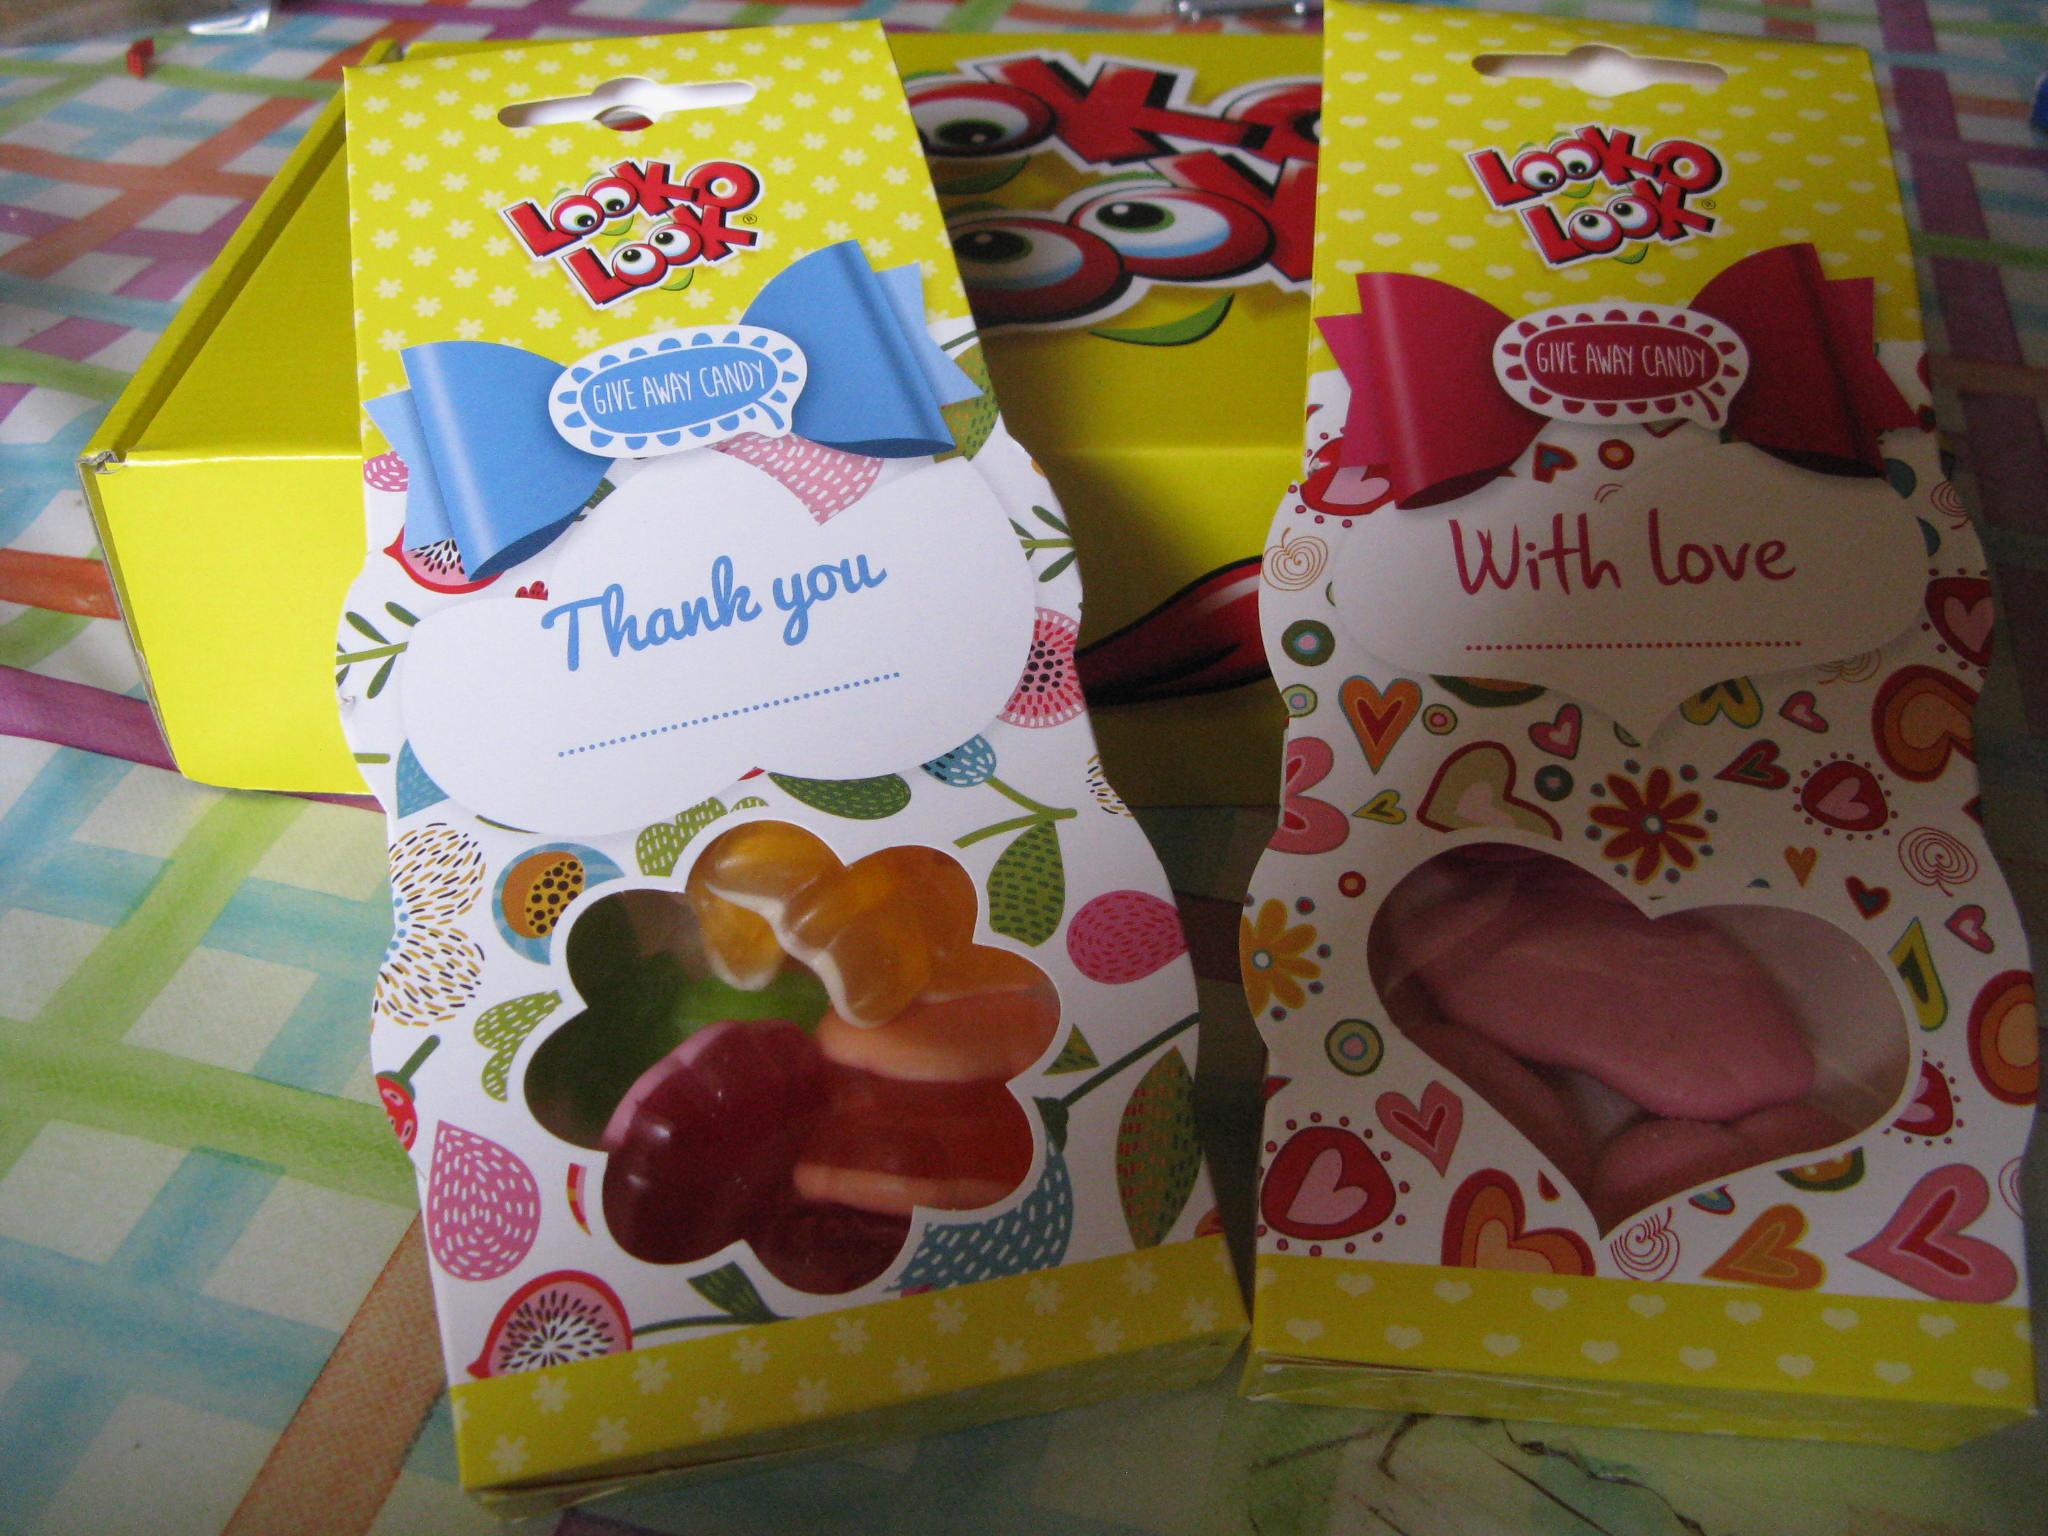 Give Away Candy Präsente von Look-o-Look